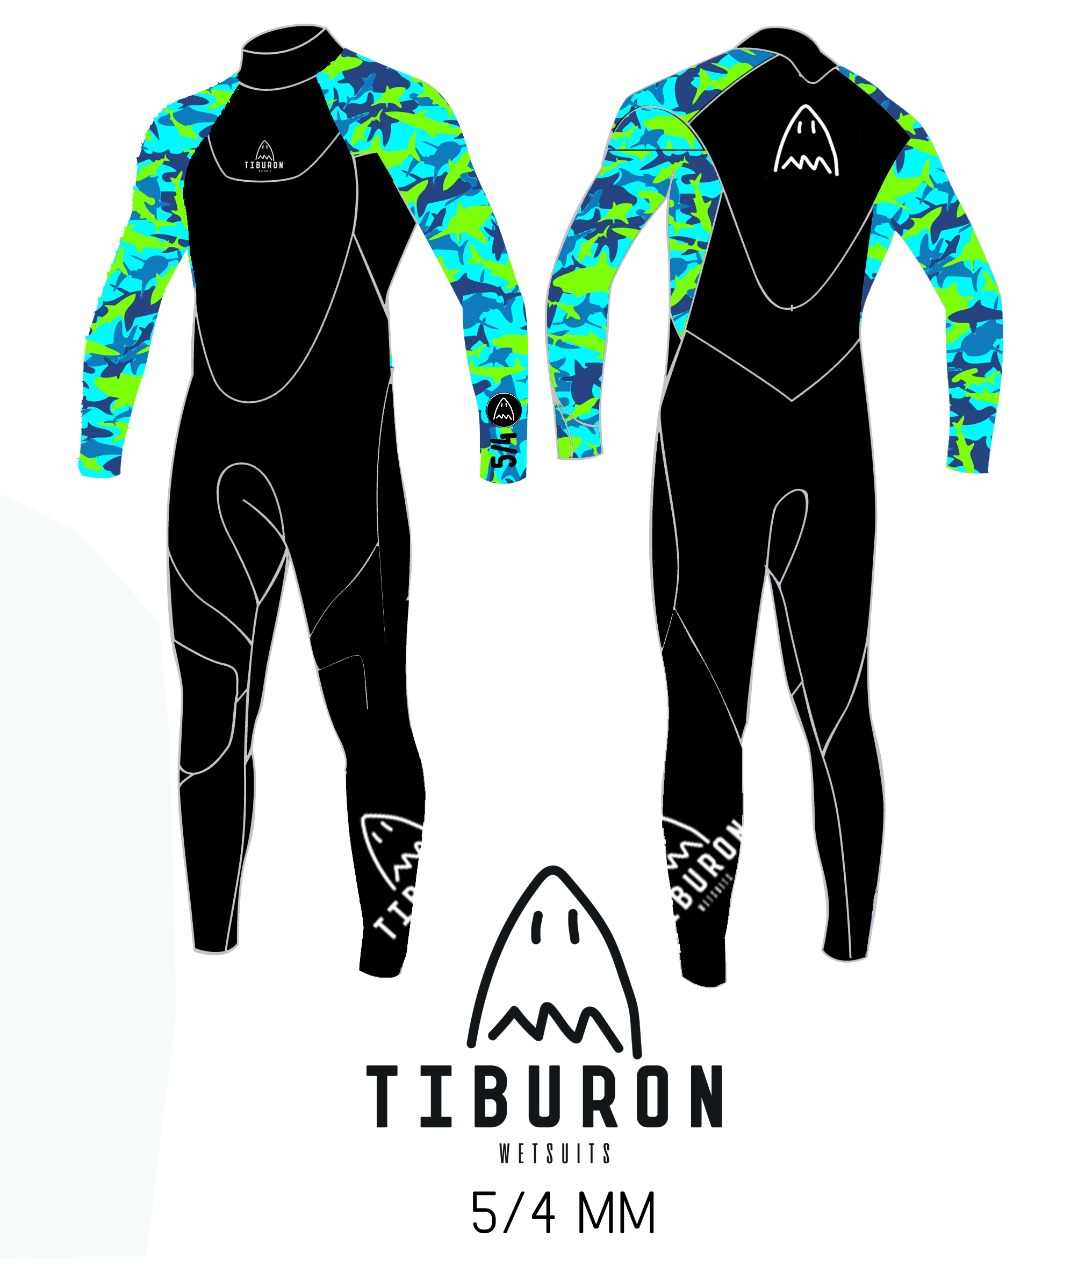 TIBURON PARTY SHARK 5/4 MM